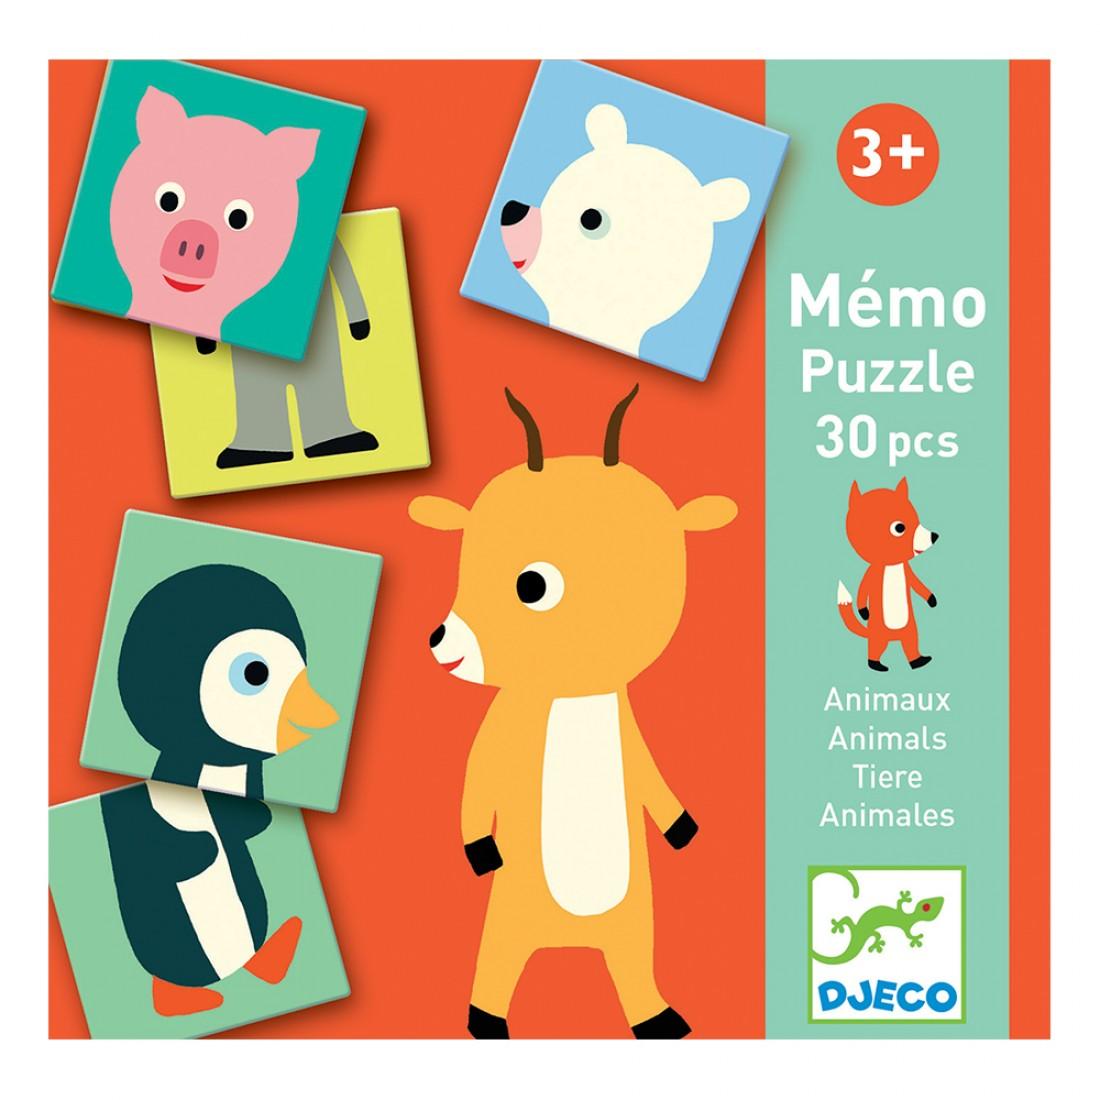 Joc memo animo puzzle djeco